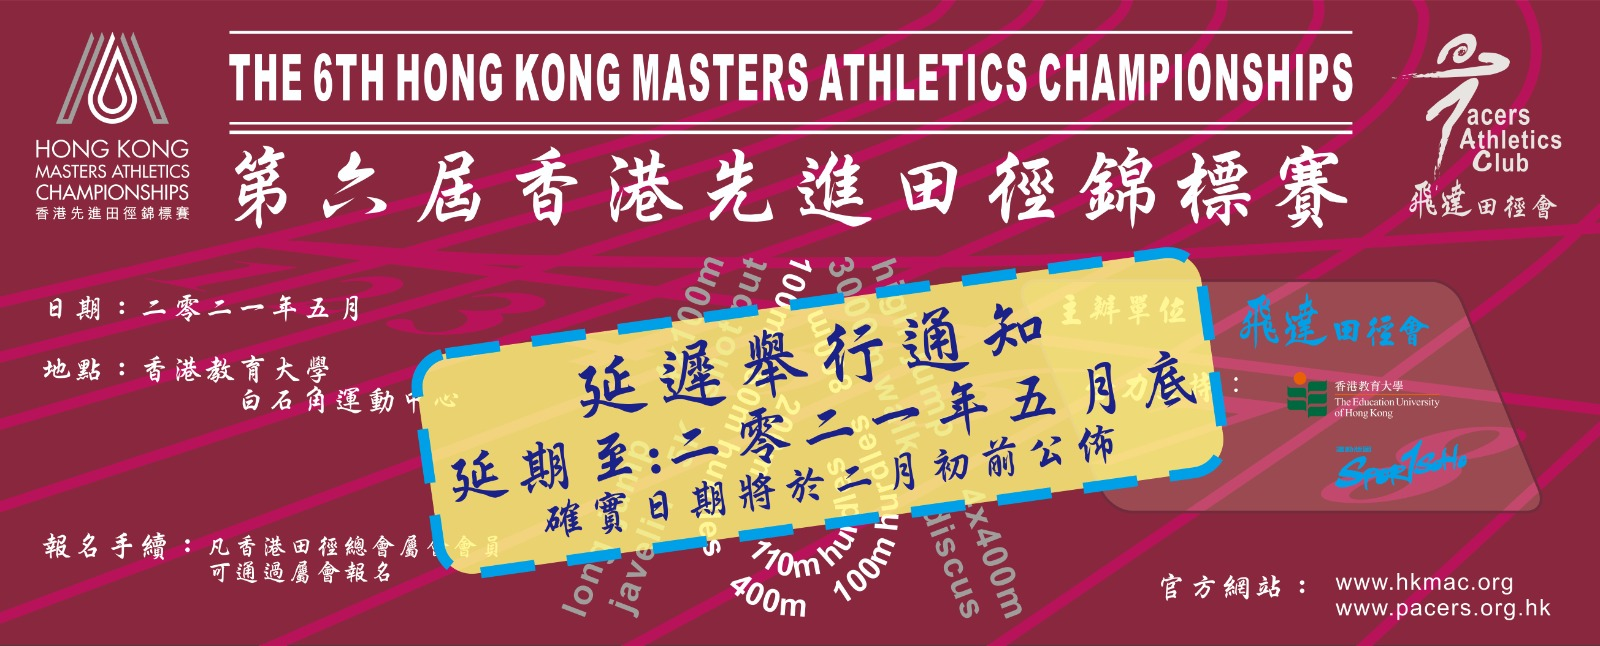 第六屆香港先進田徑錦標賽 (第二次)延期通知 THE 6th HONG KONG MASTERS ATHLETICS CHAMPIONSHIPS (SECOND Postponed)